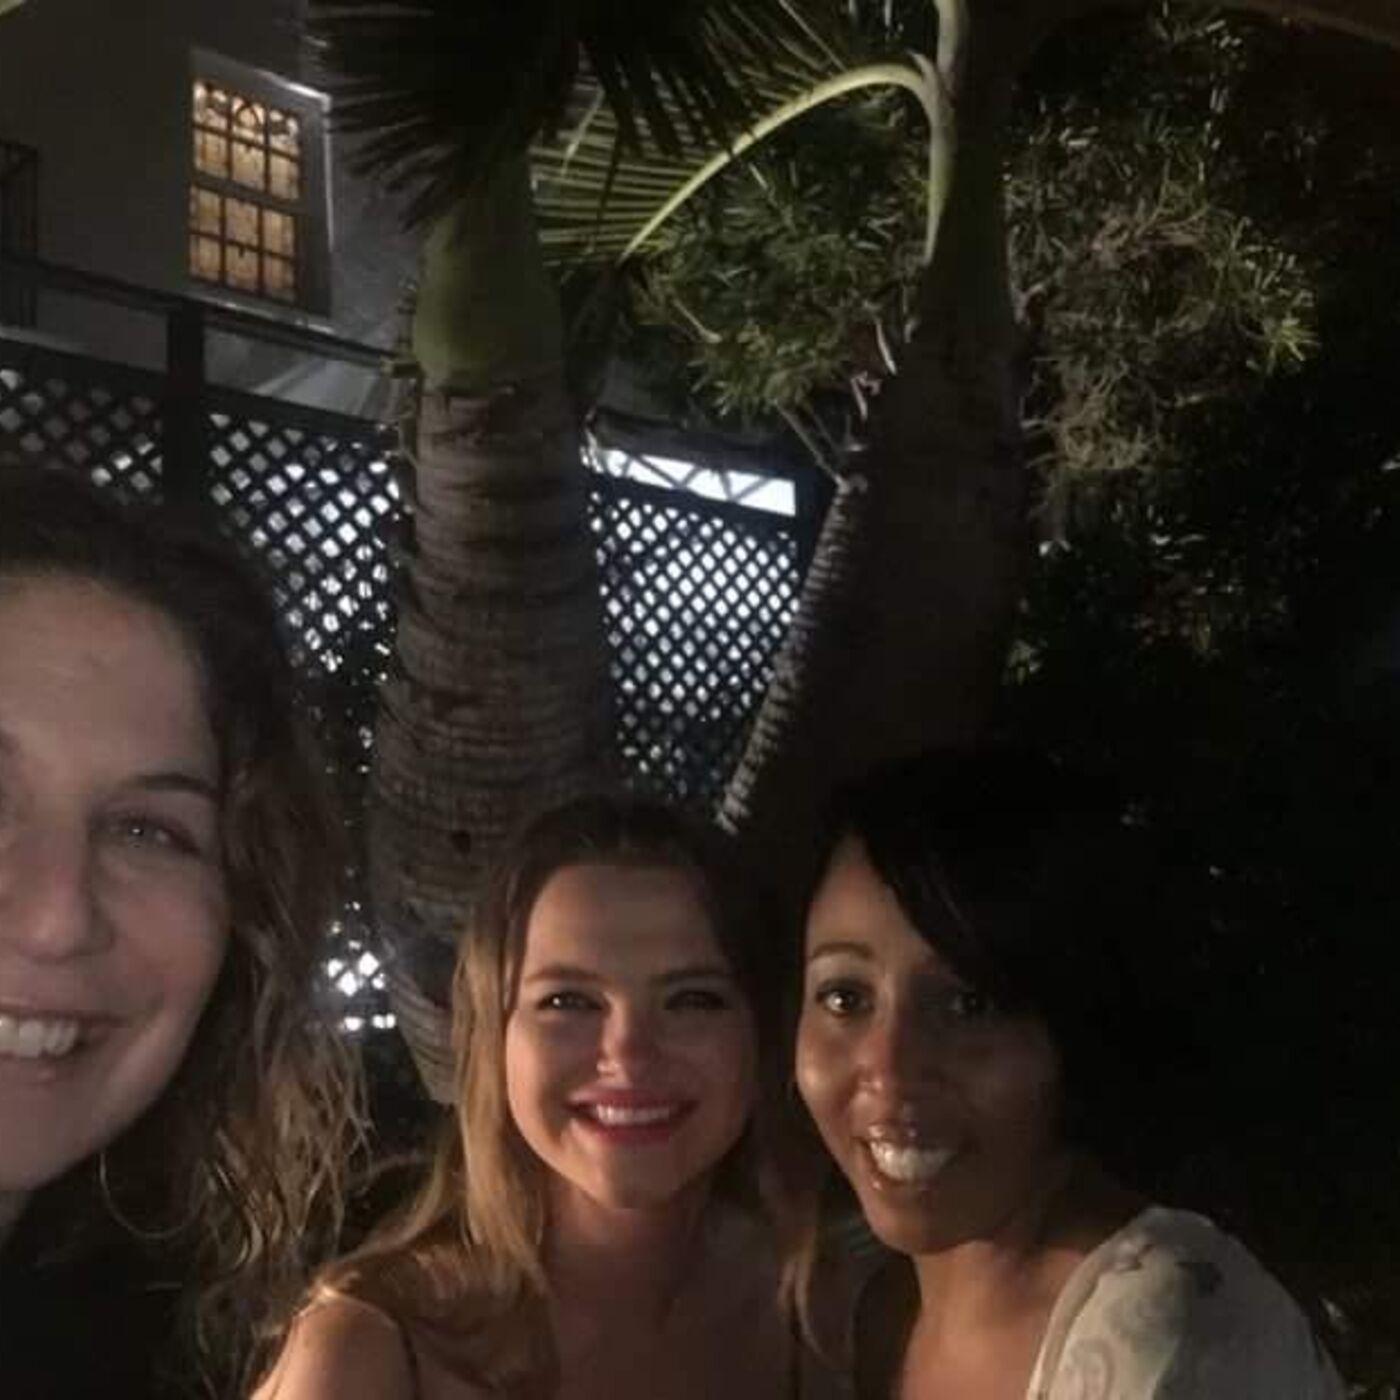 Jamee & Leonissa: An Artful Miami Connection